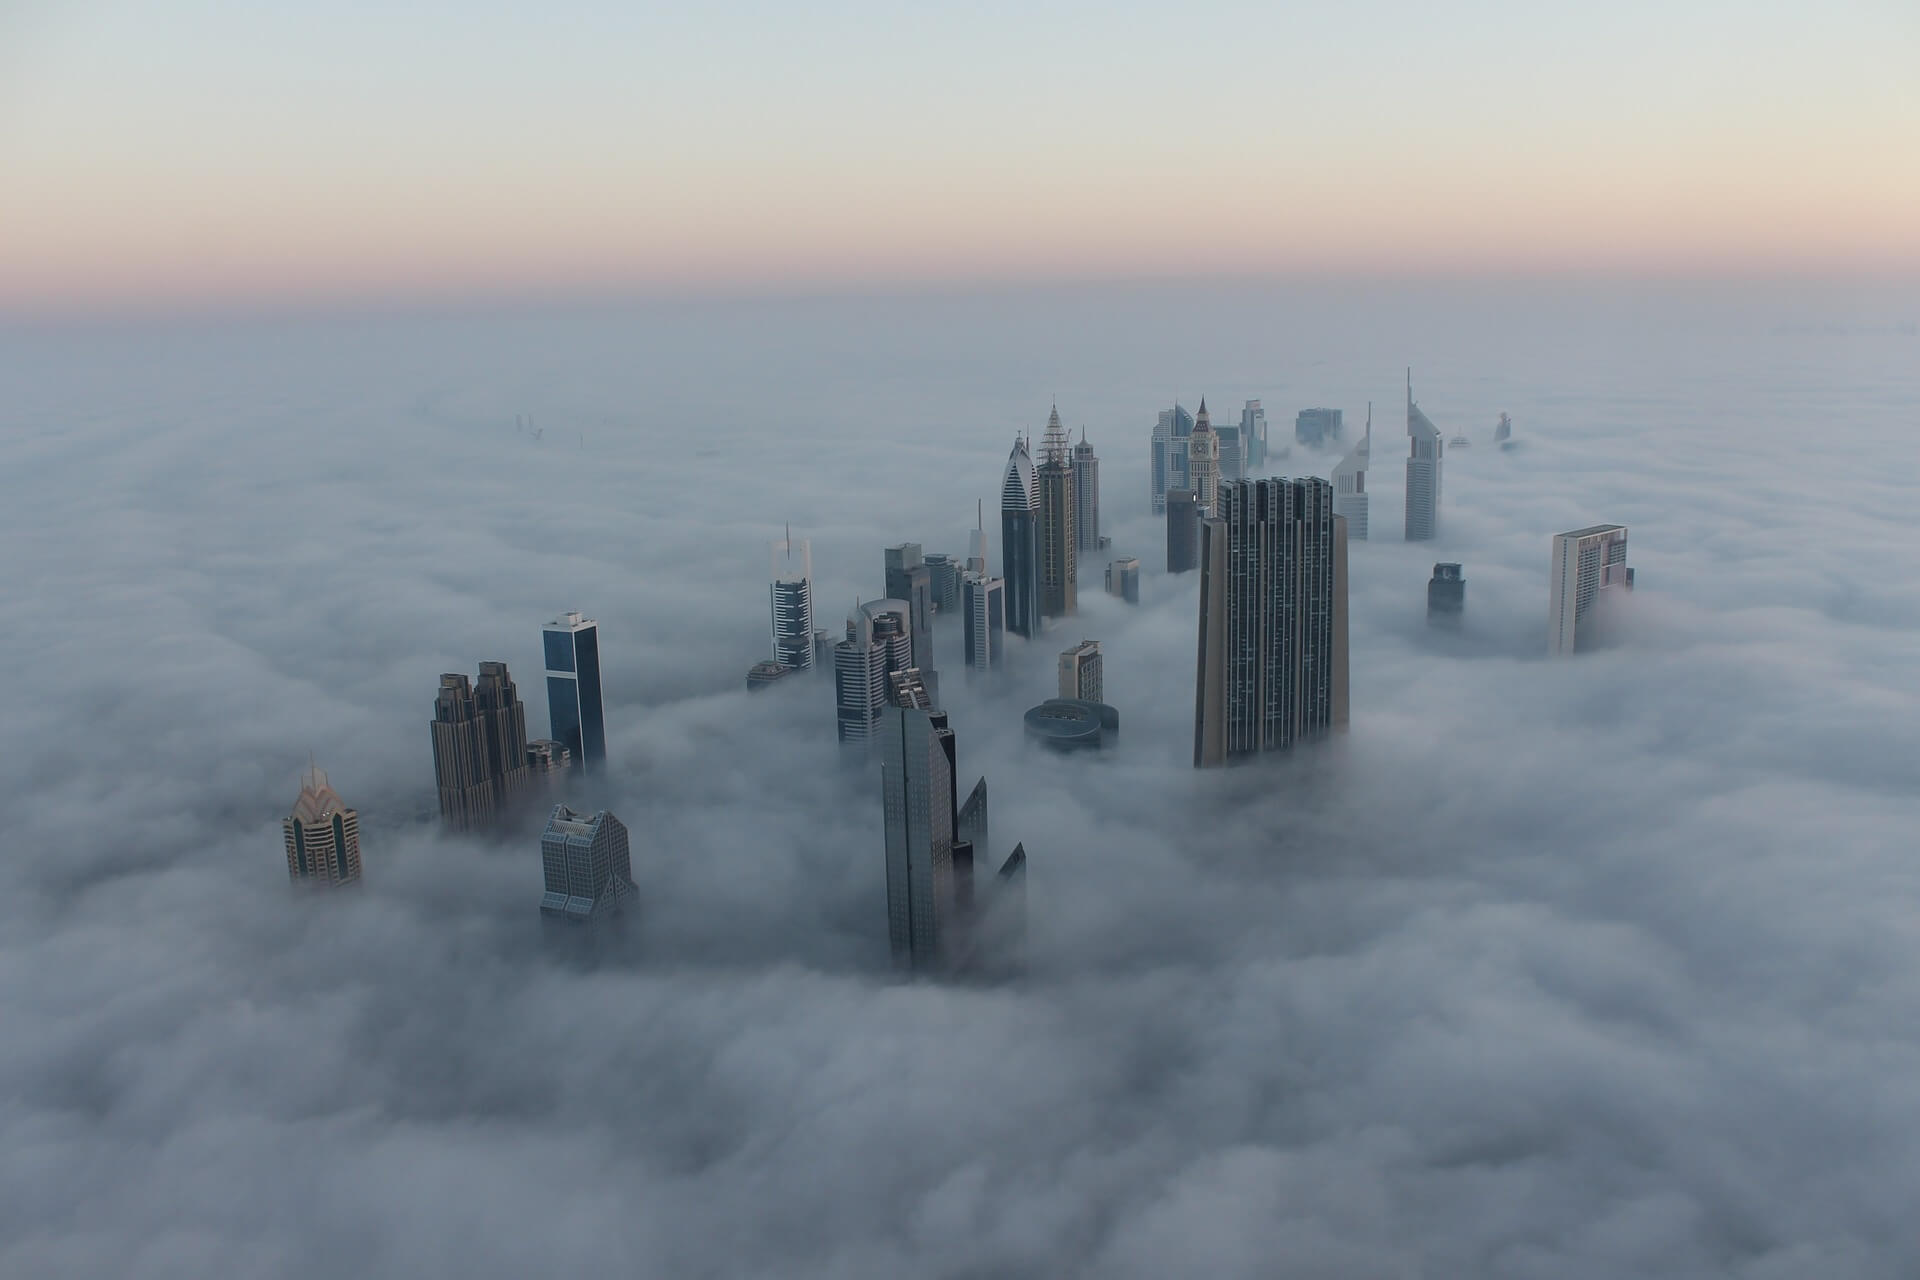 Cityscape Dubai in fog